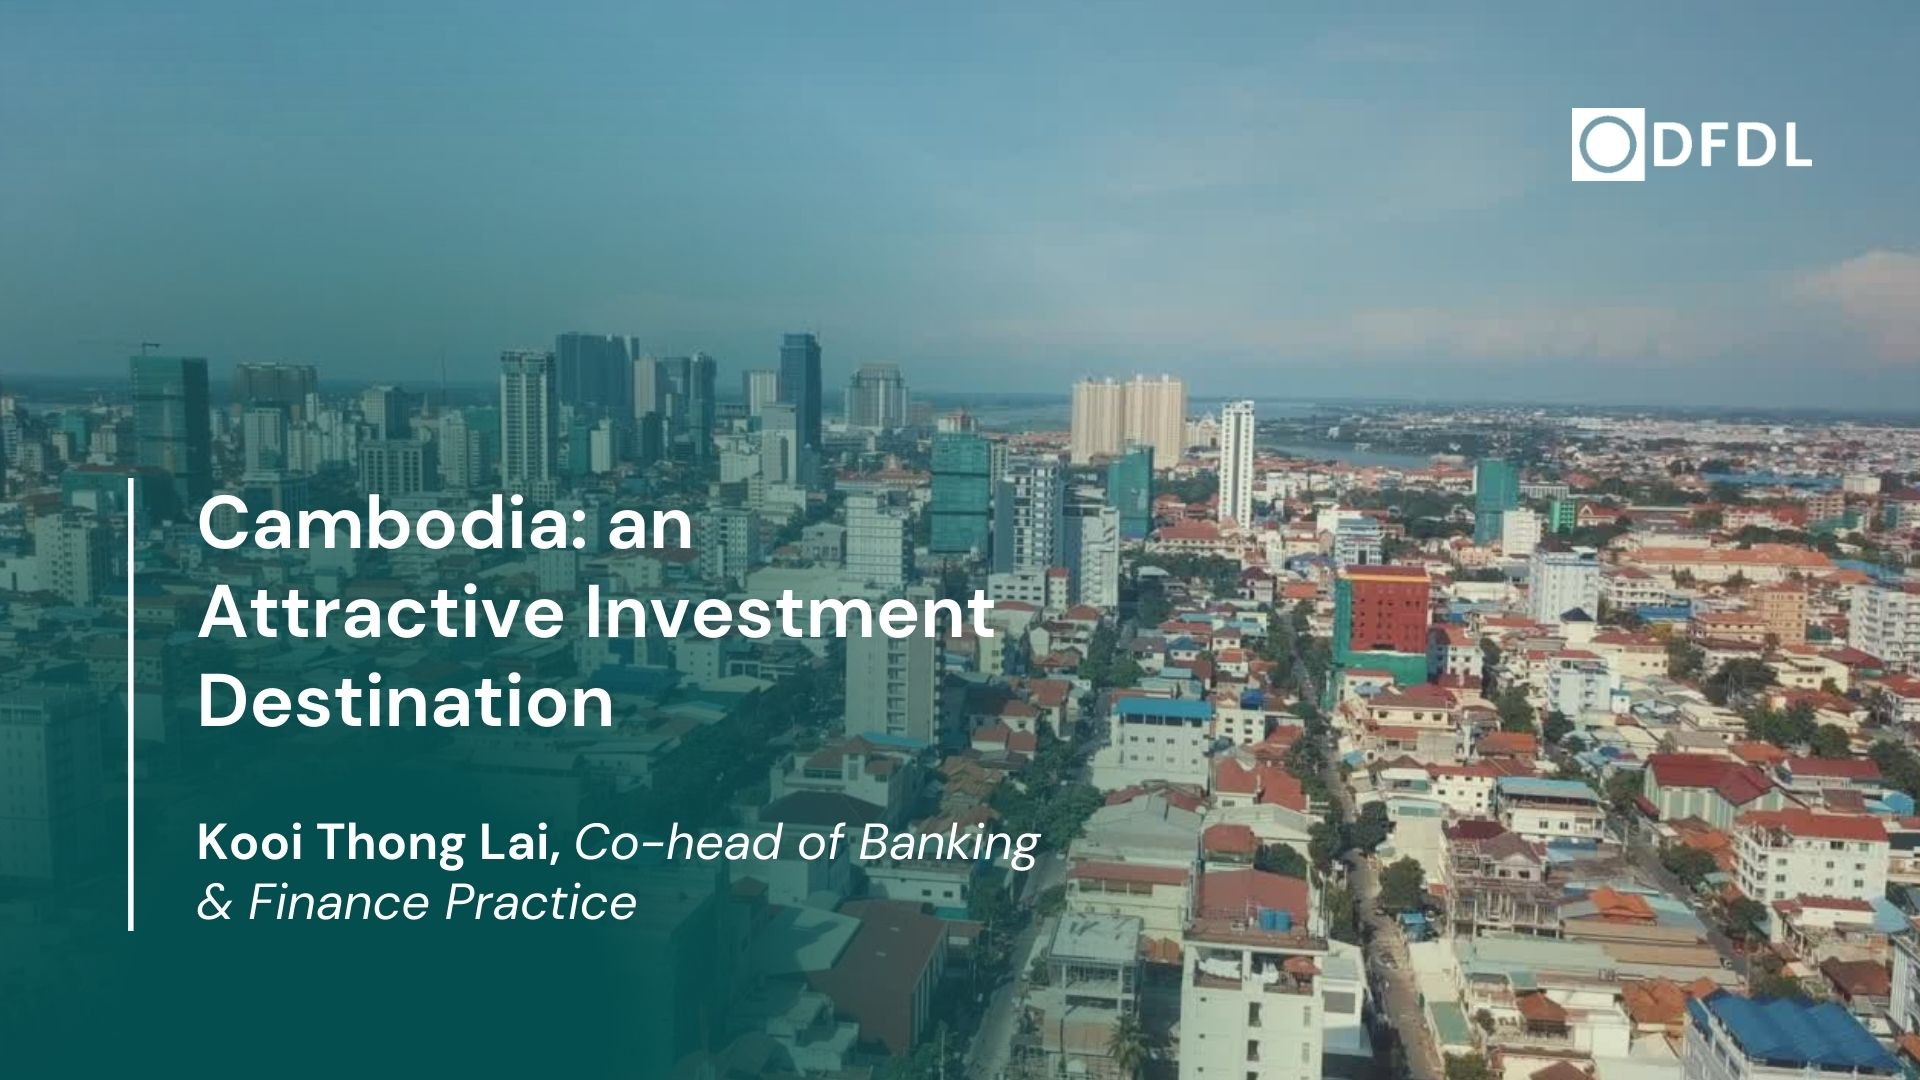 Cambodia: an Attractive Investment Destination